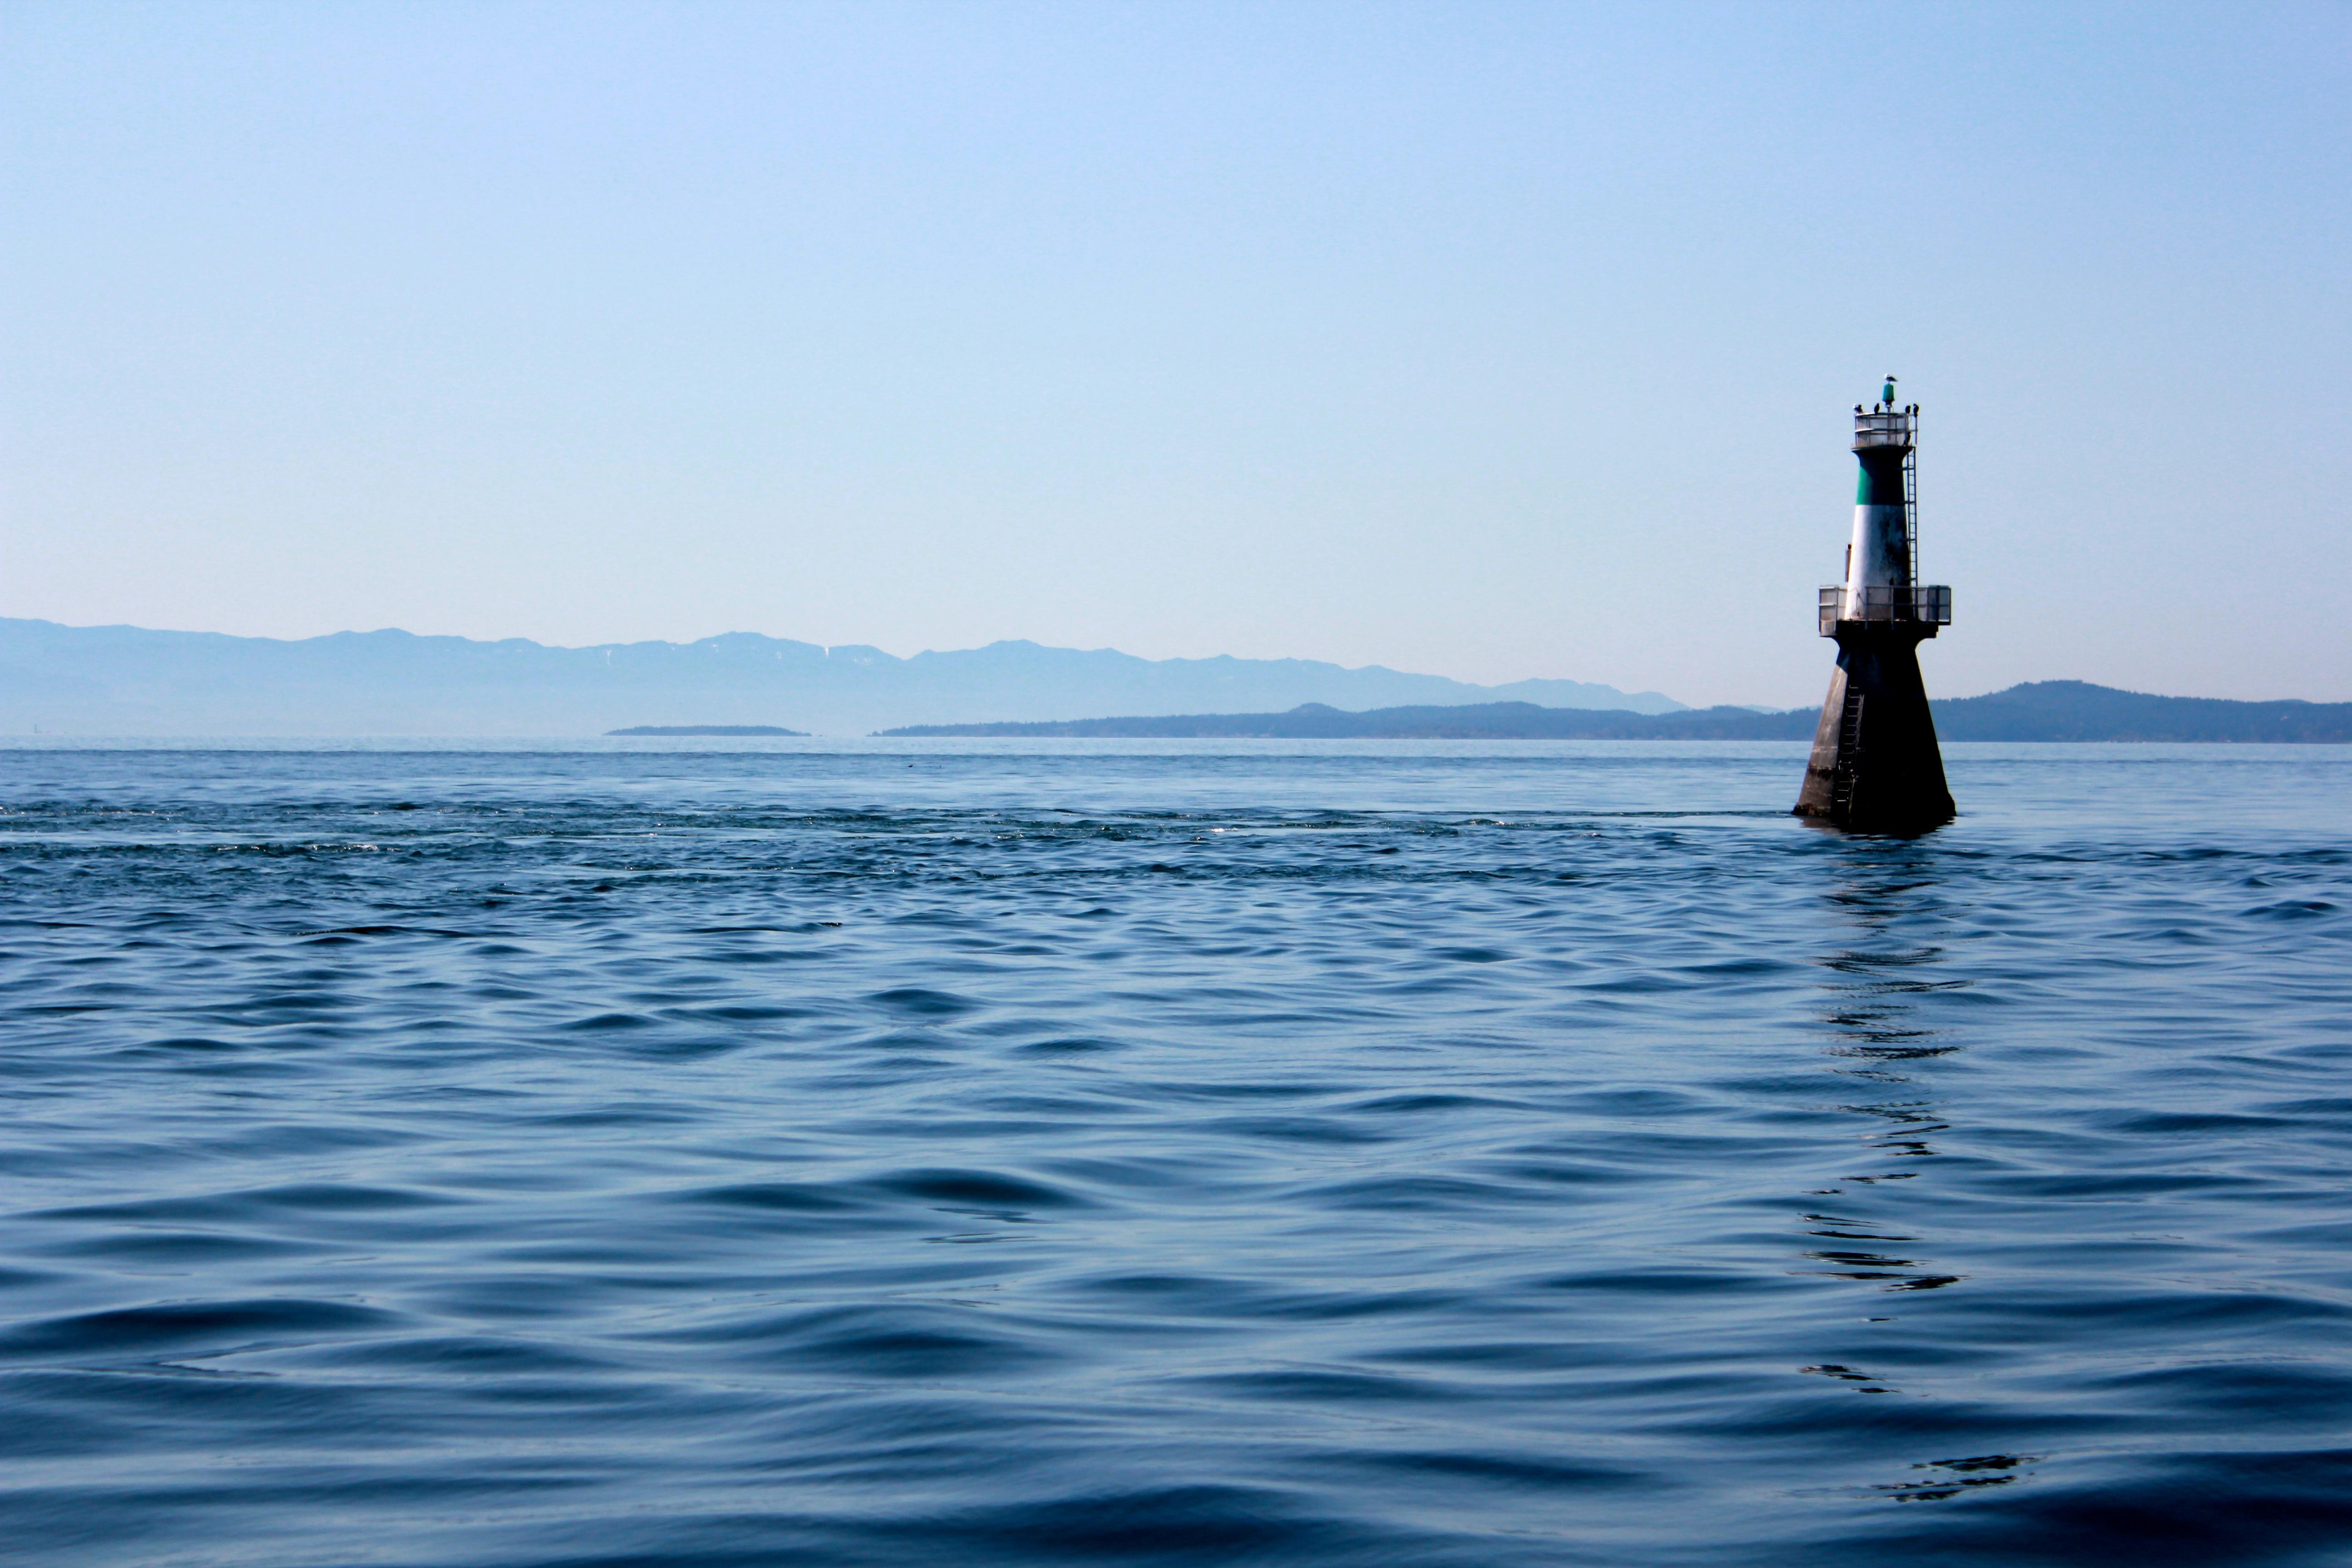 Ocean Pier off the coast of Vancouver Island